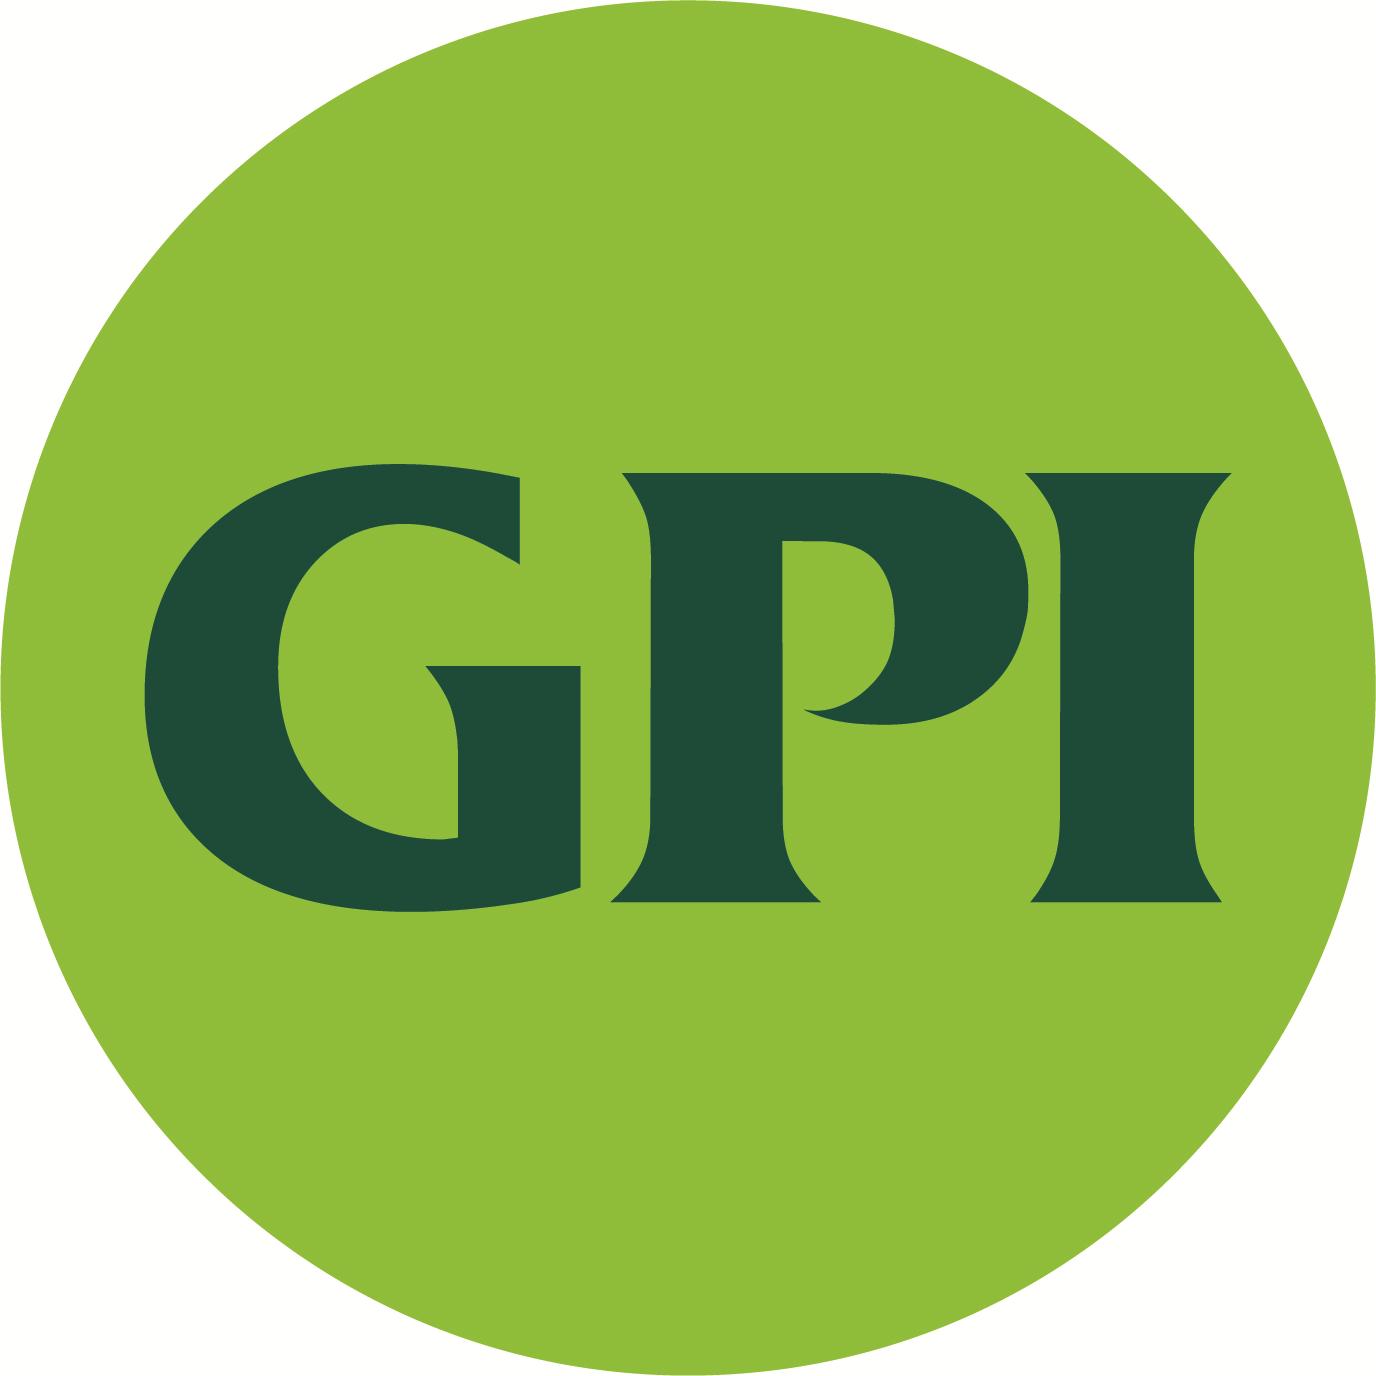 Greenman-Pedersen, Inc Company Logo